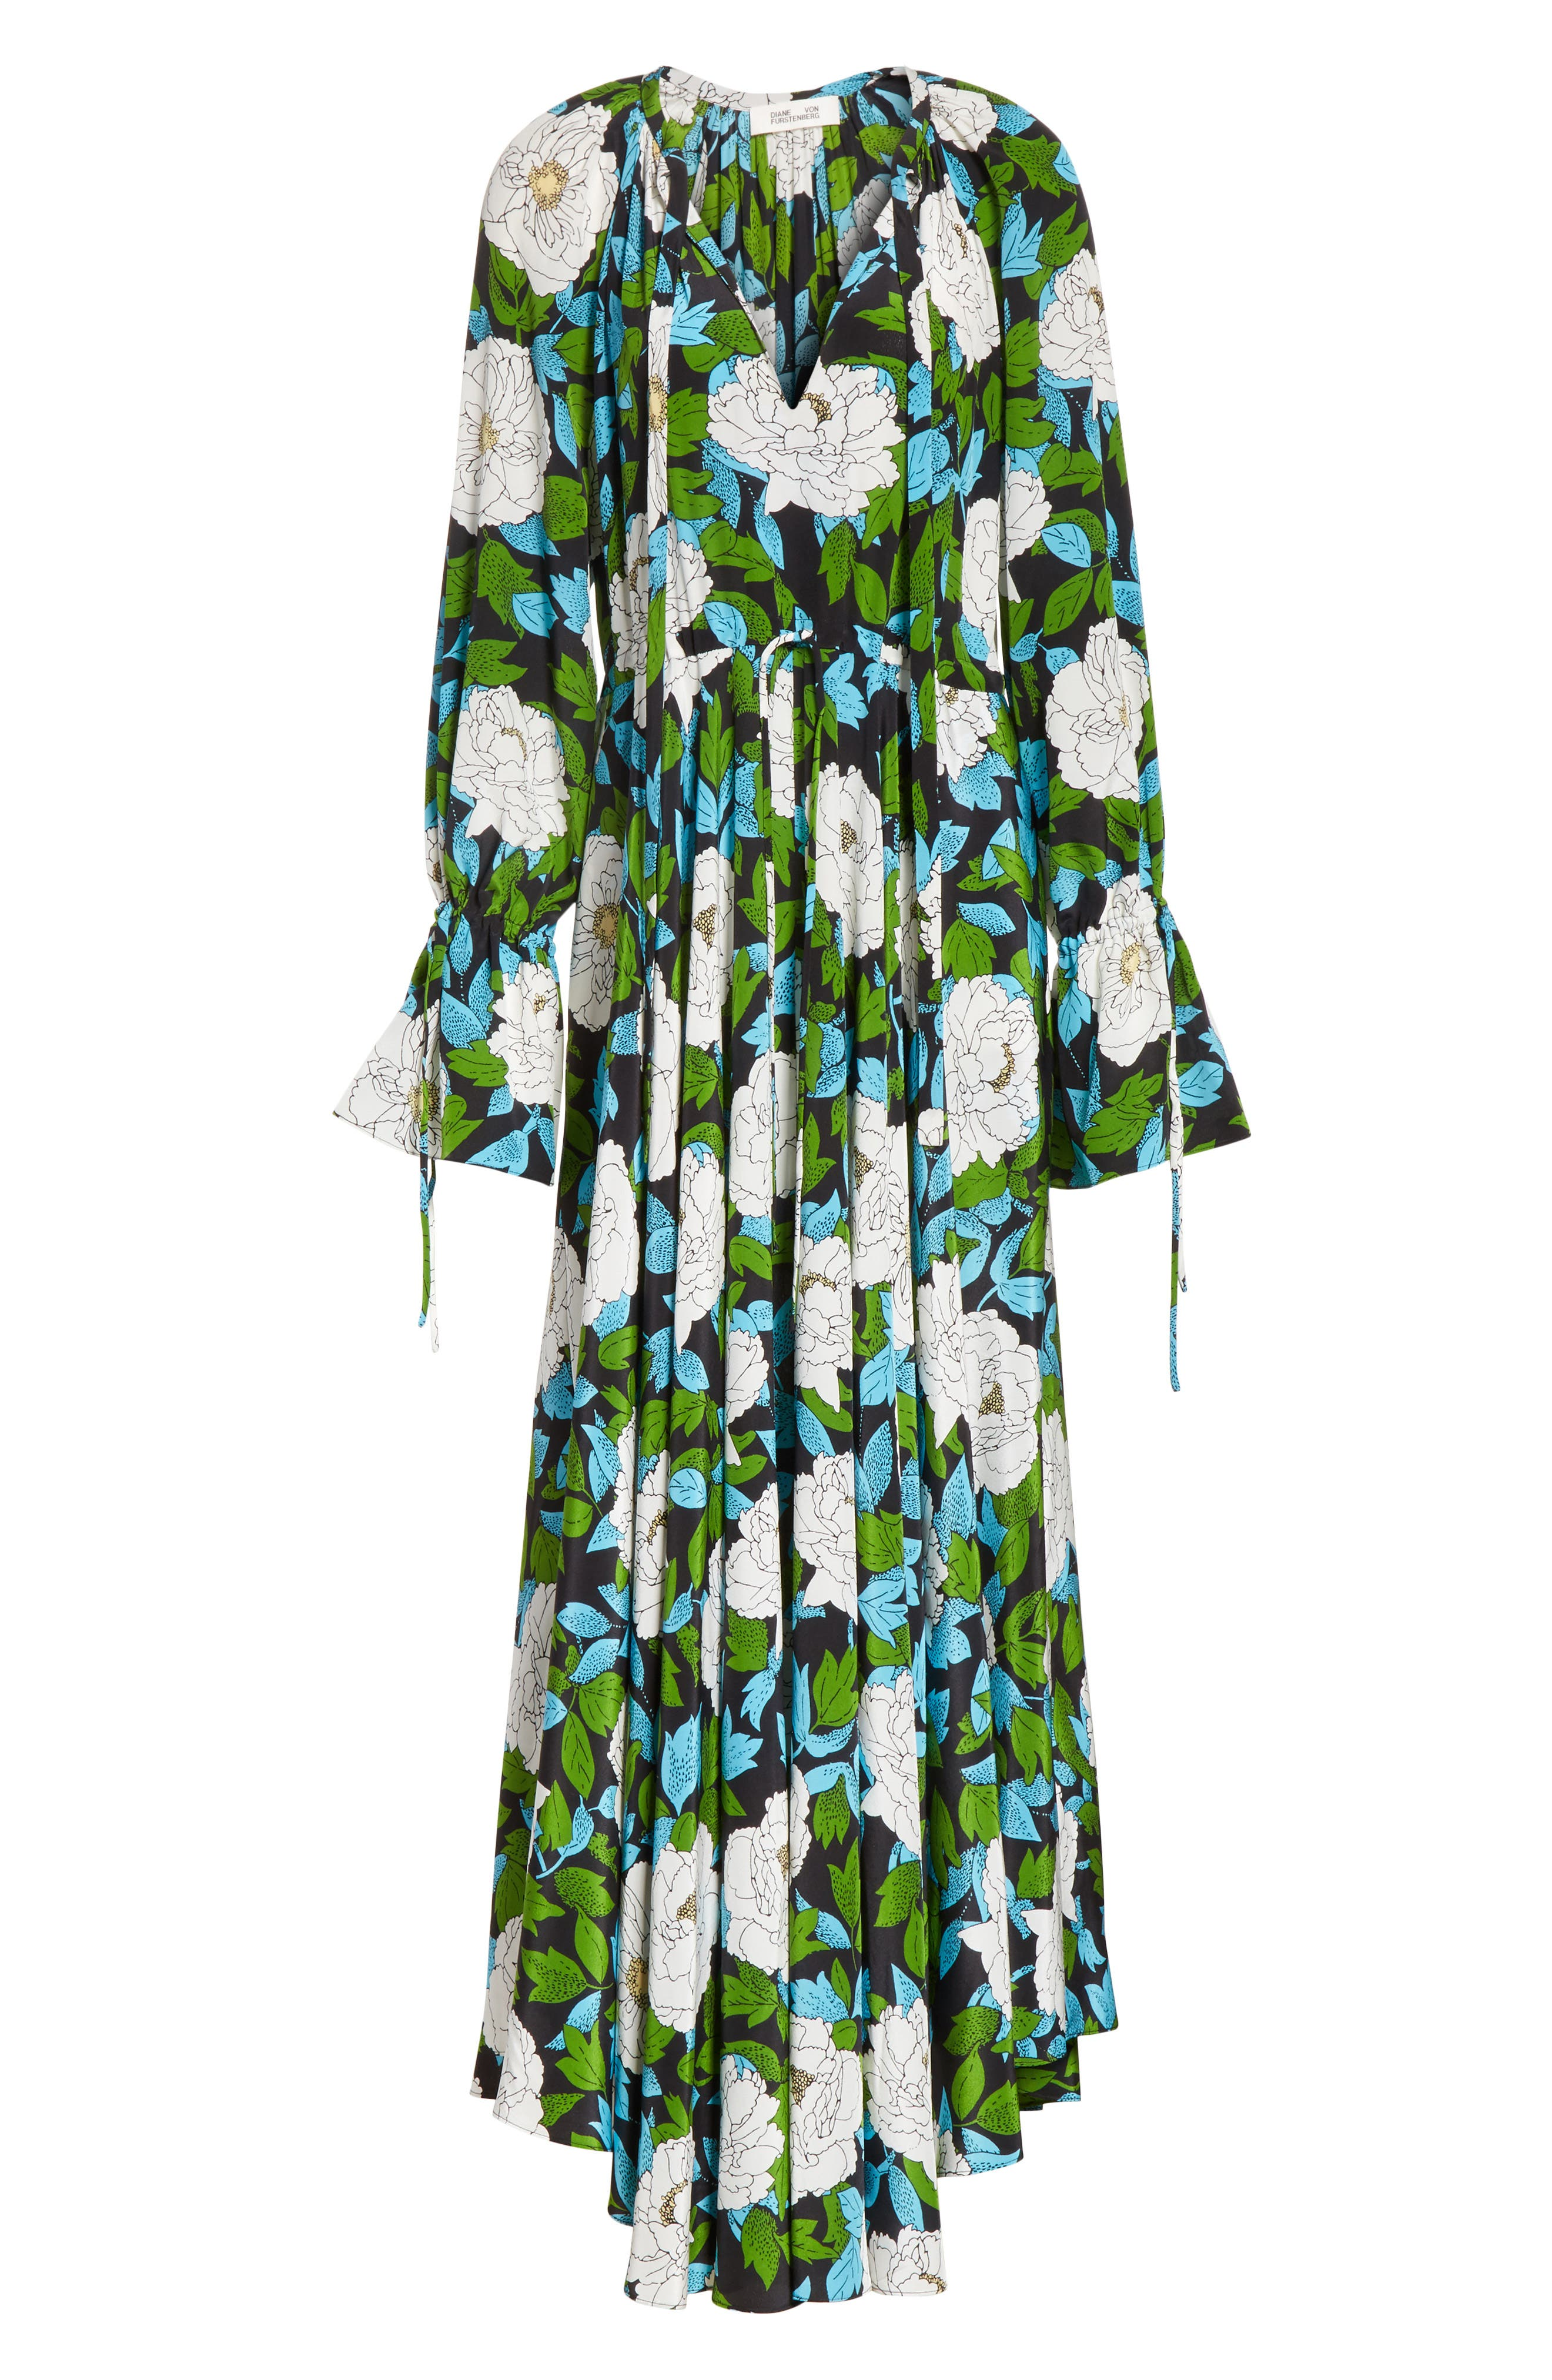 Diane von Furstenberg Floral Silk Maxi Dress,                             Alternate thumbnail 6, color,                             389